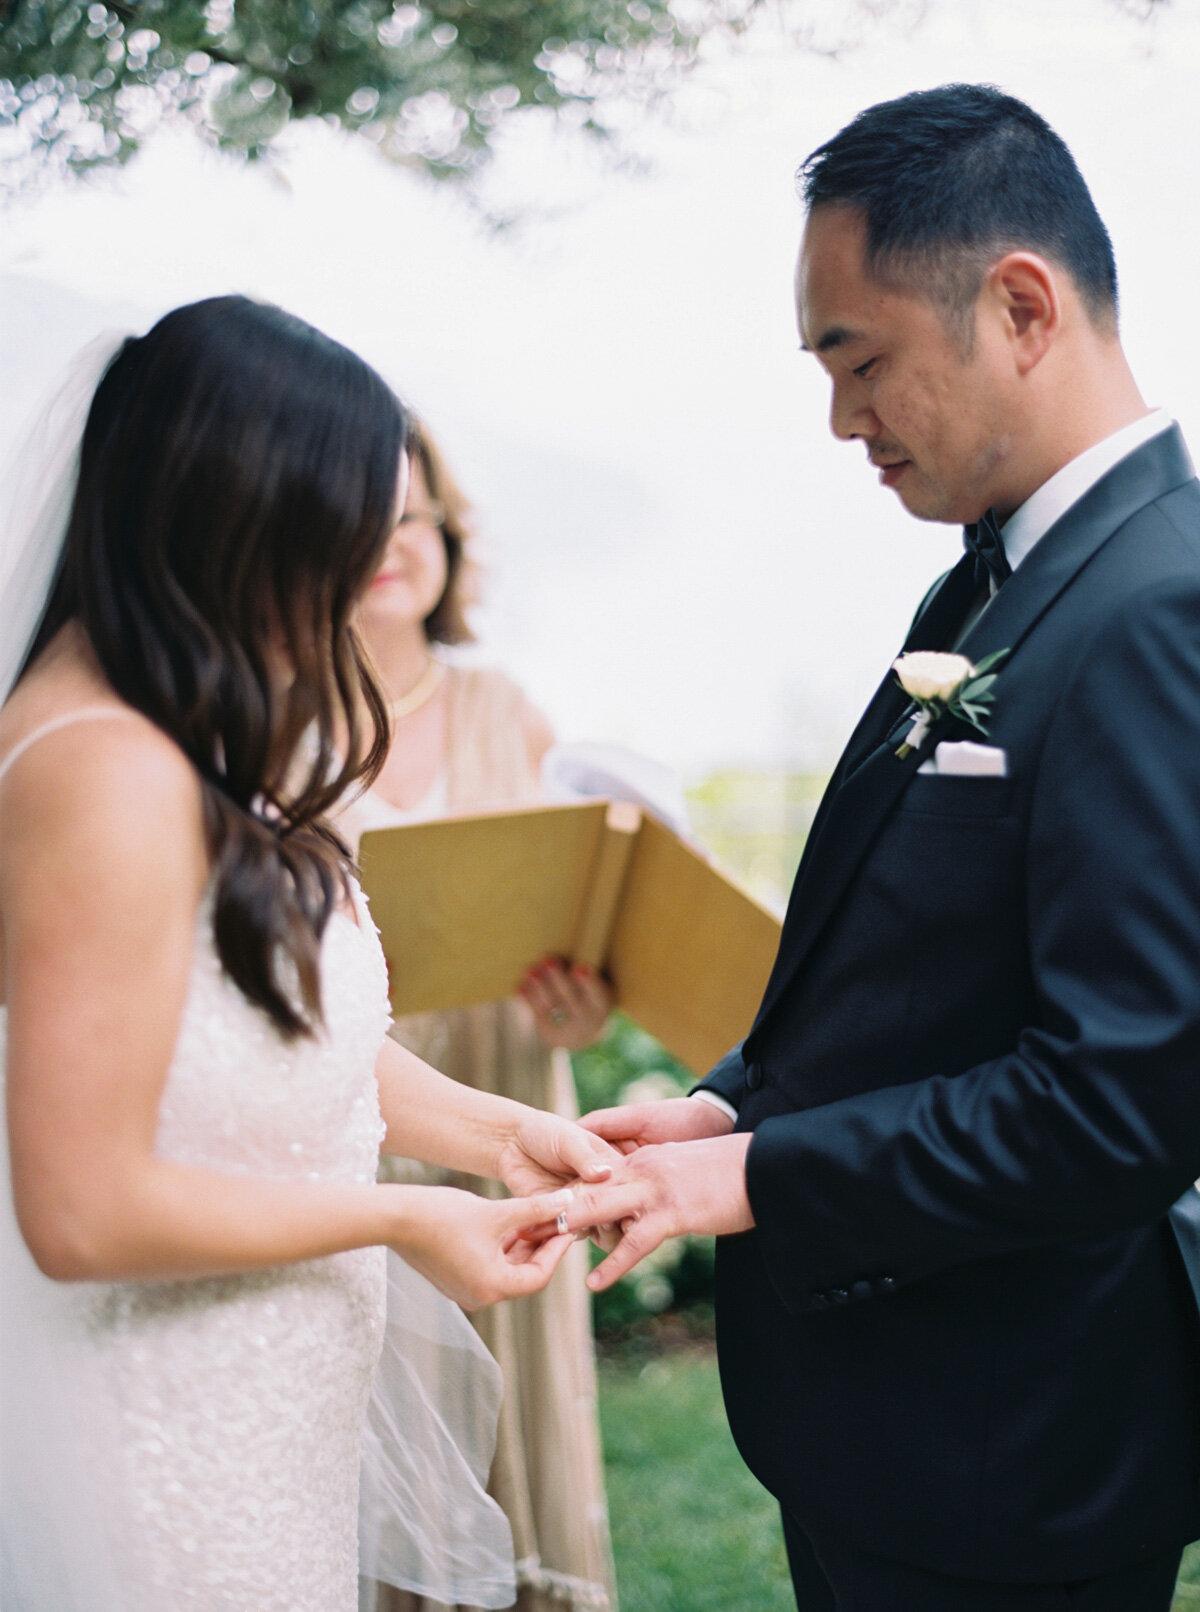 Belmond-Hotel-Caruso-ravello-elopement-Katie-Grant-destination-wedding (28 of 50).jpg